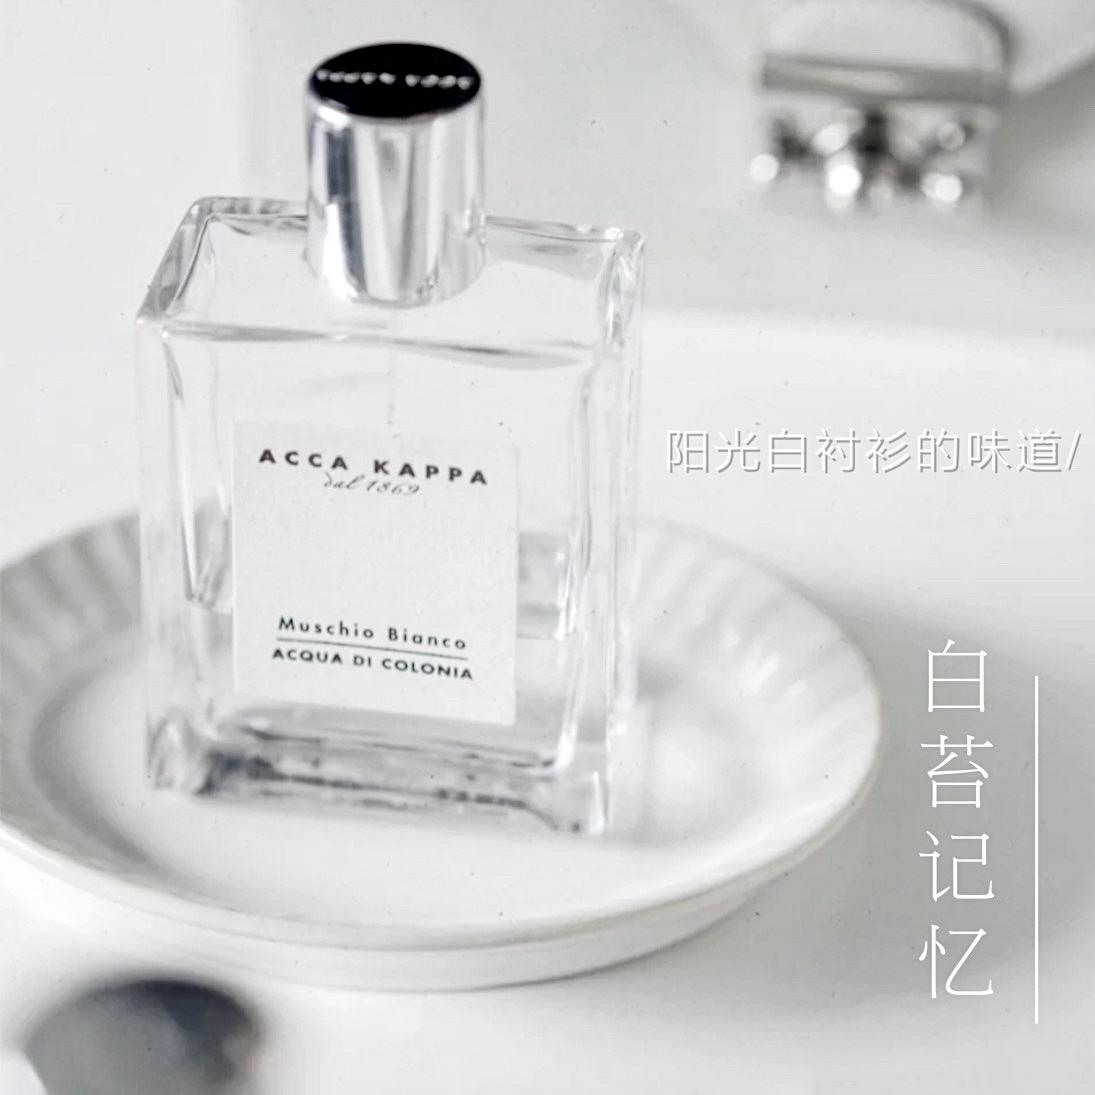 ACCA KAPPA白苔古龙水30ml 地中海香调 中性香水 清新自然白麝香